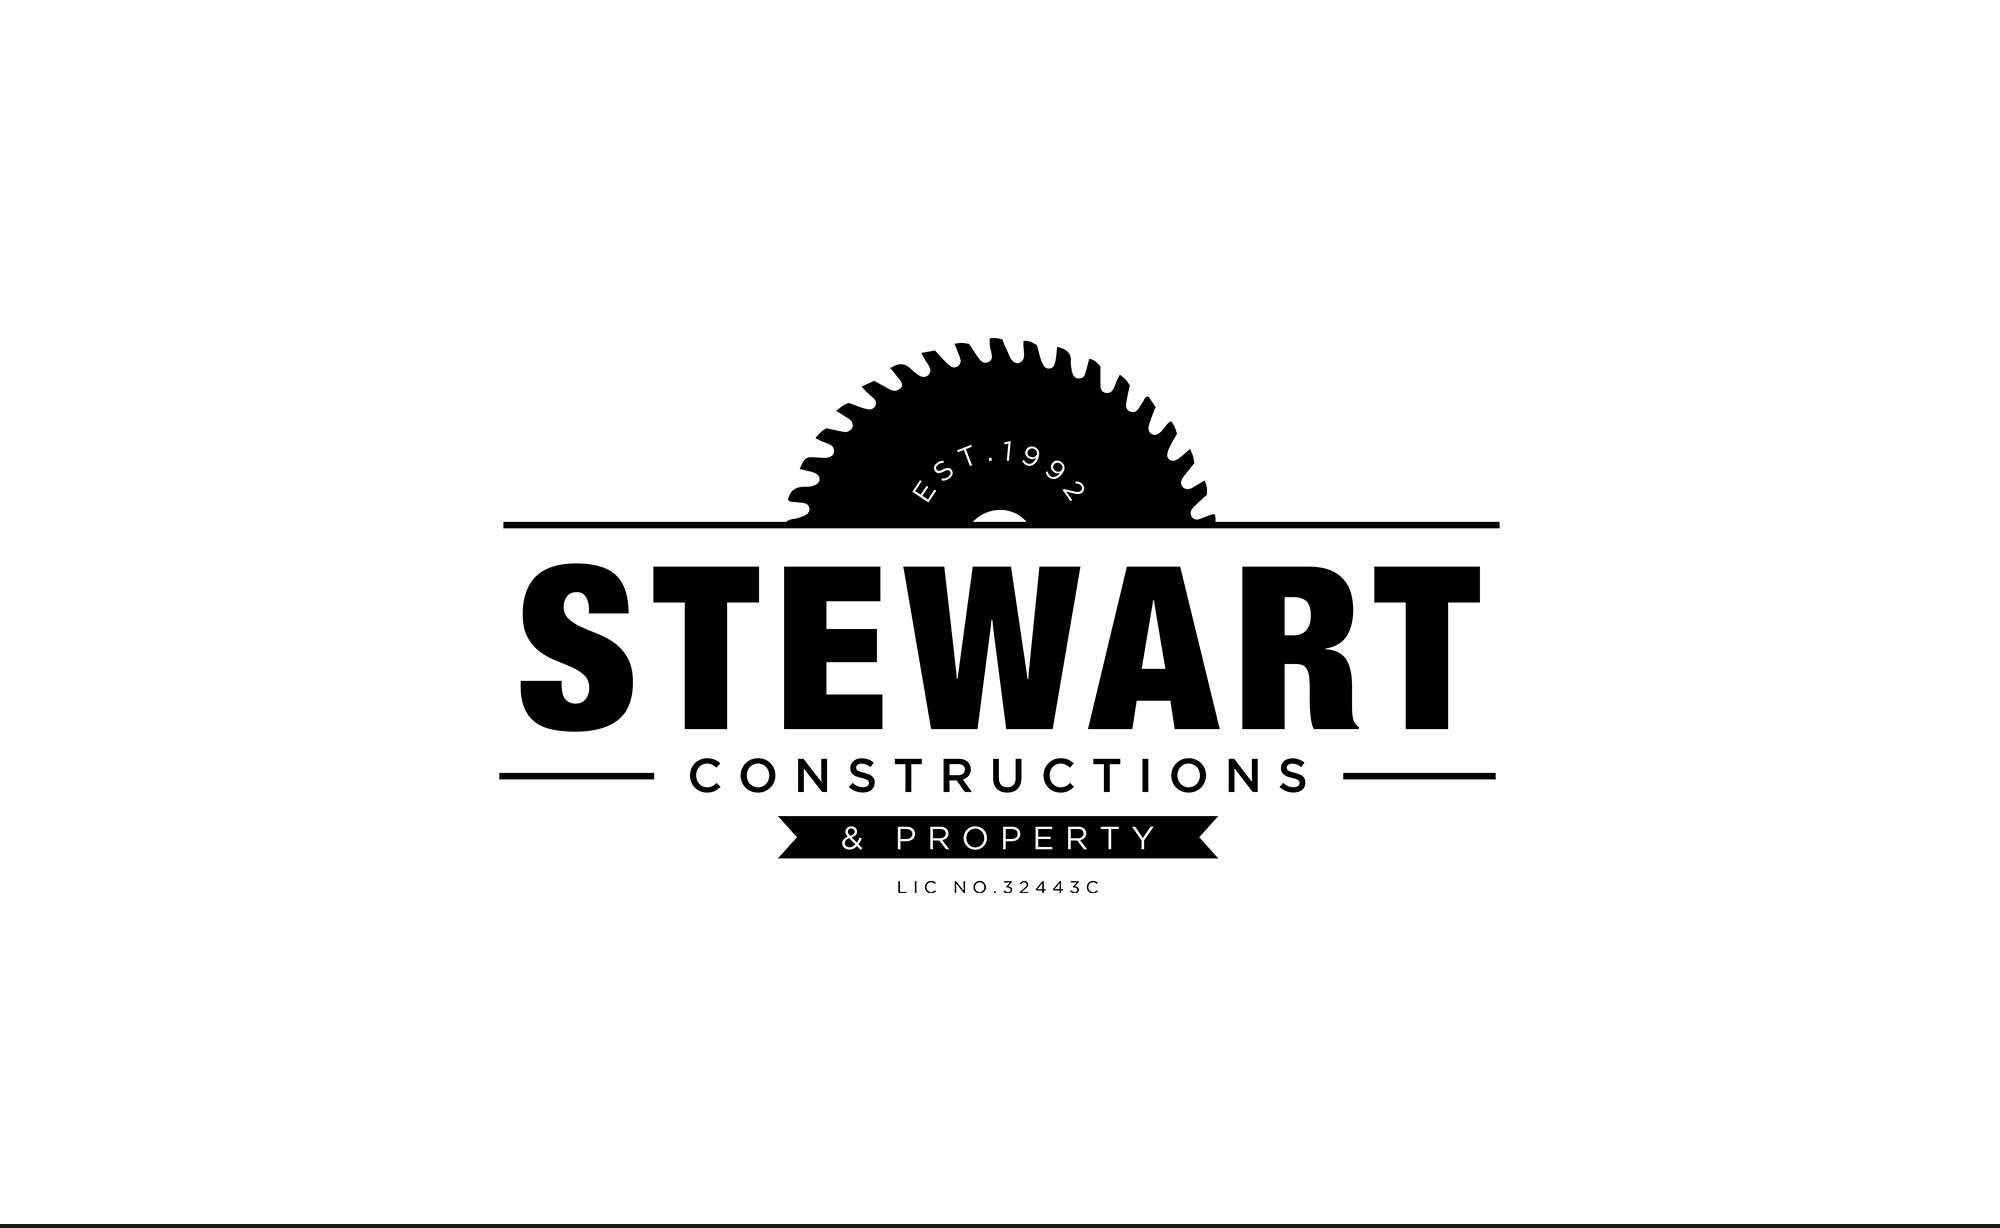 © ChrisRaeDesign.com Sydney Brand Identity Graphic Web Print Design Creative Direction Chris Rae Design Stewart Construction and Building03.jpg